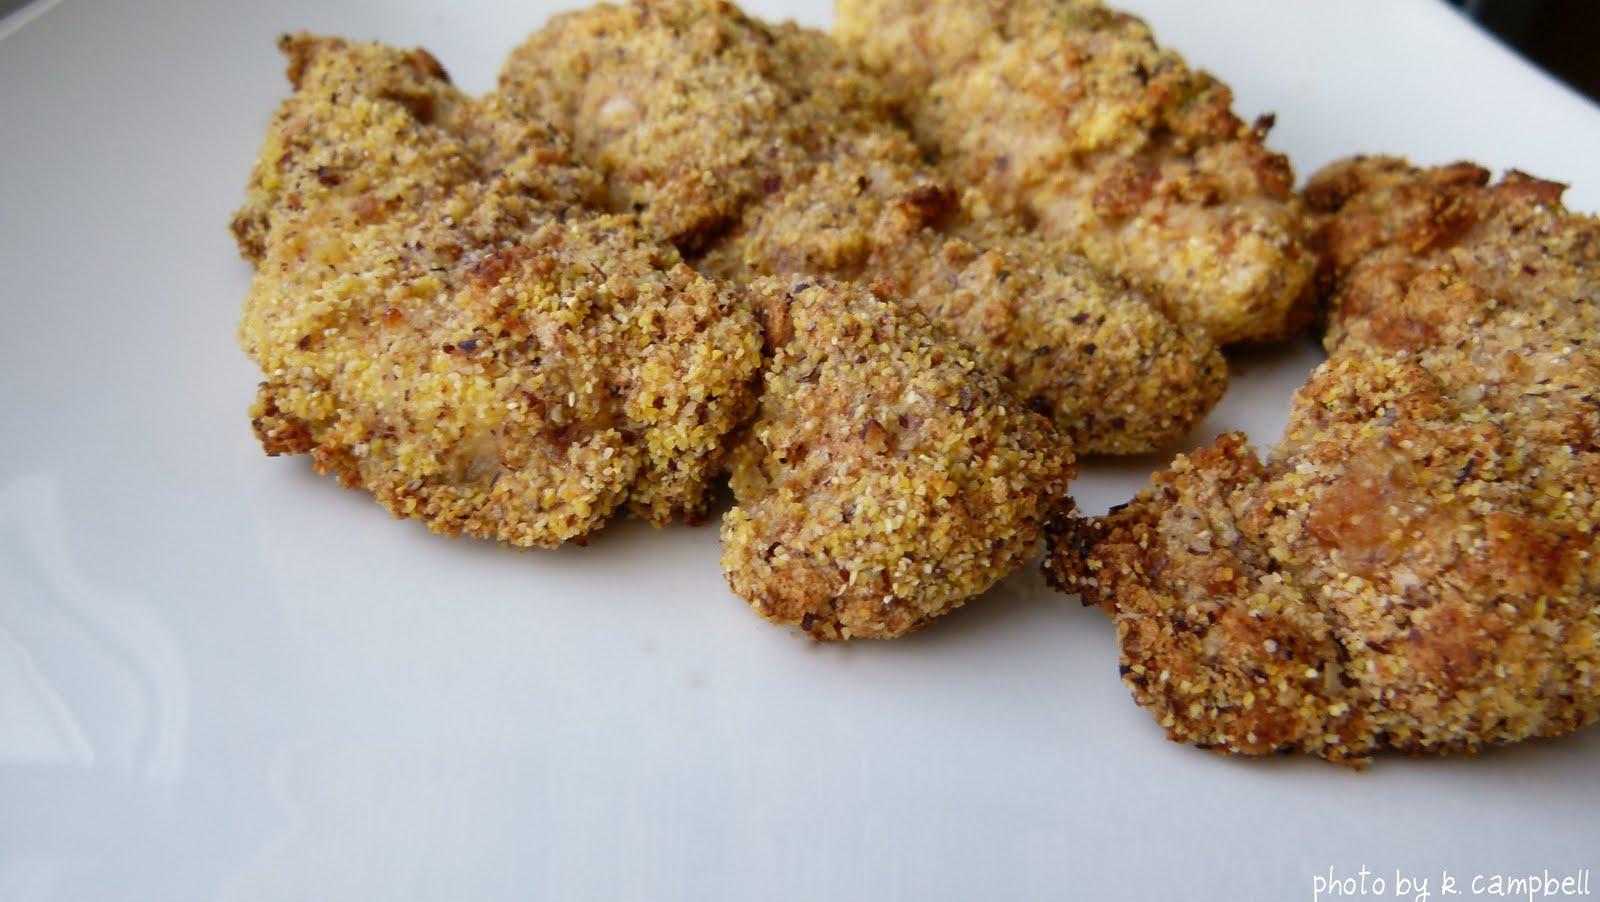 Oscar's Sandwich: Gluten Free Baked Chicken Strips